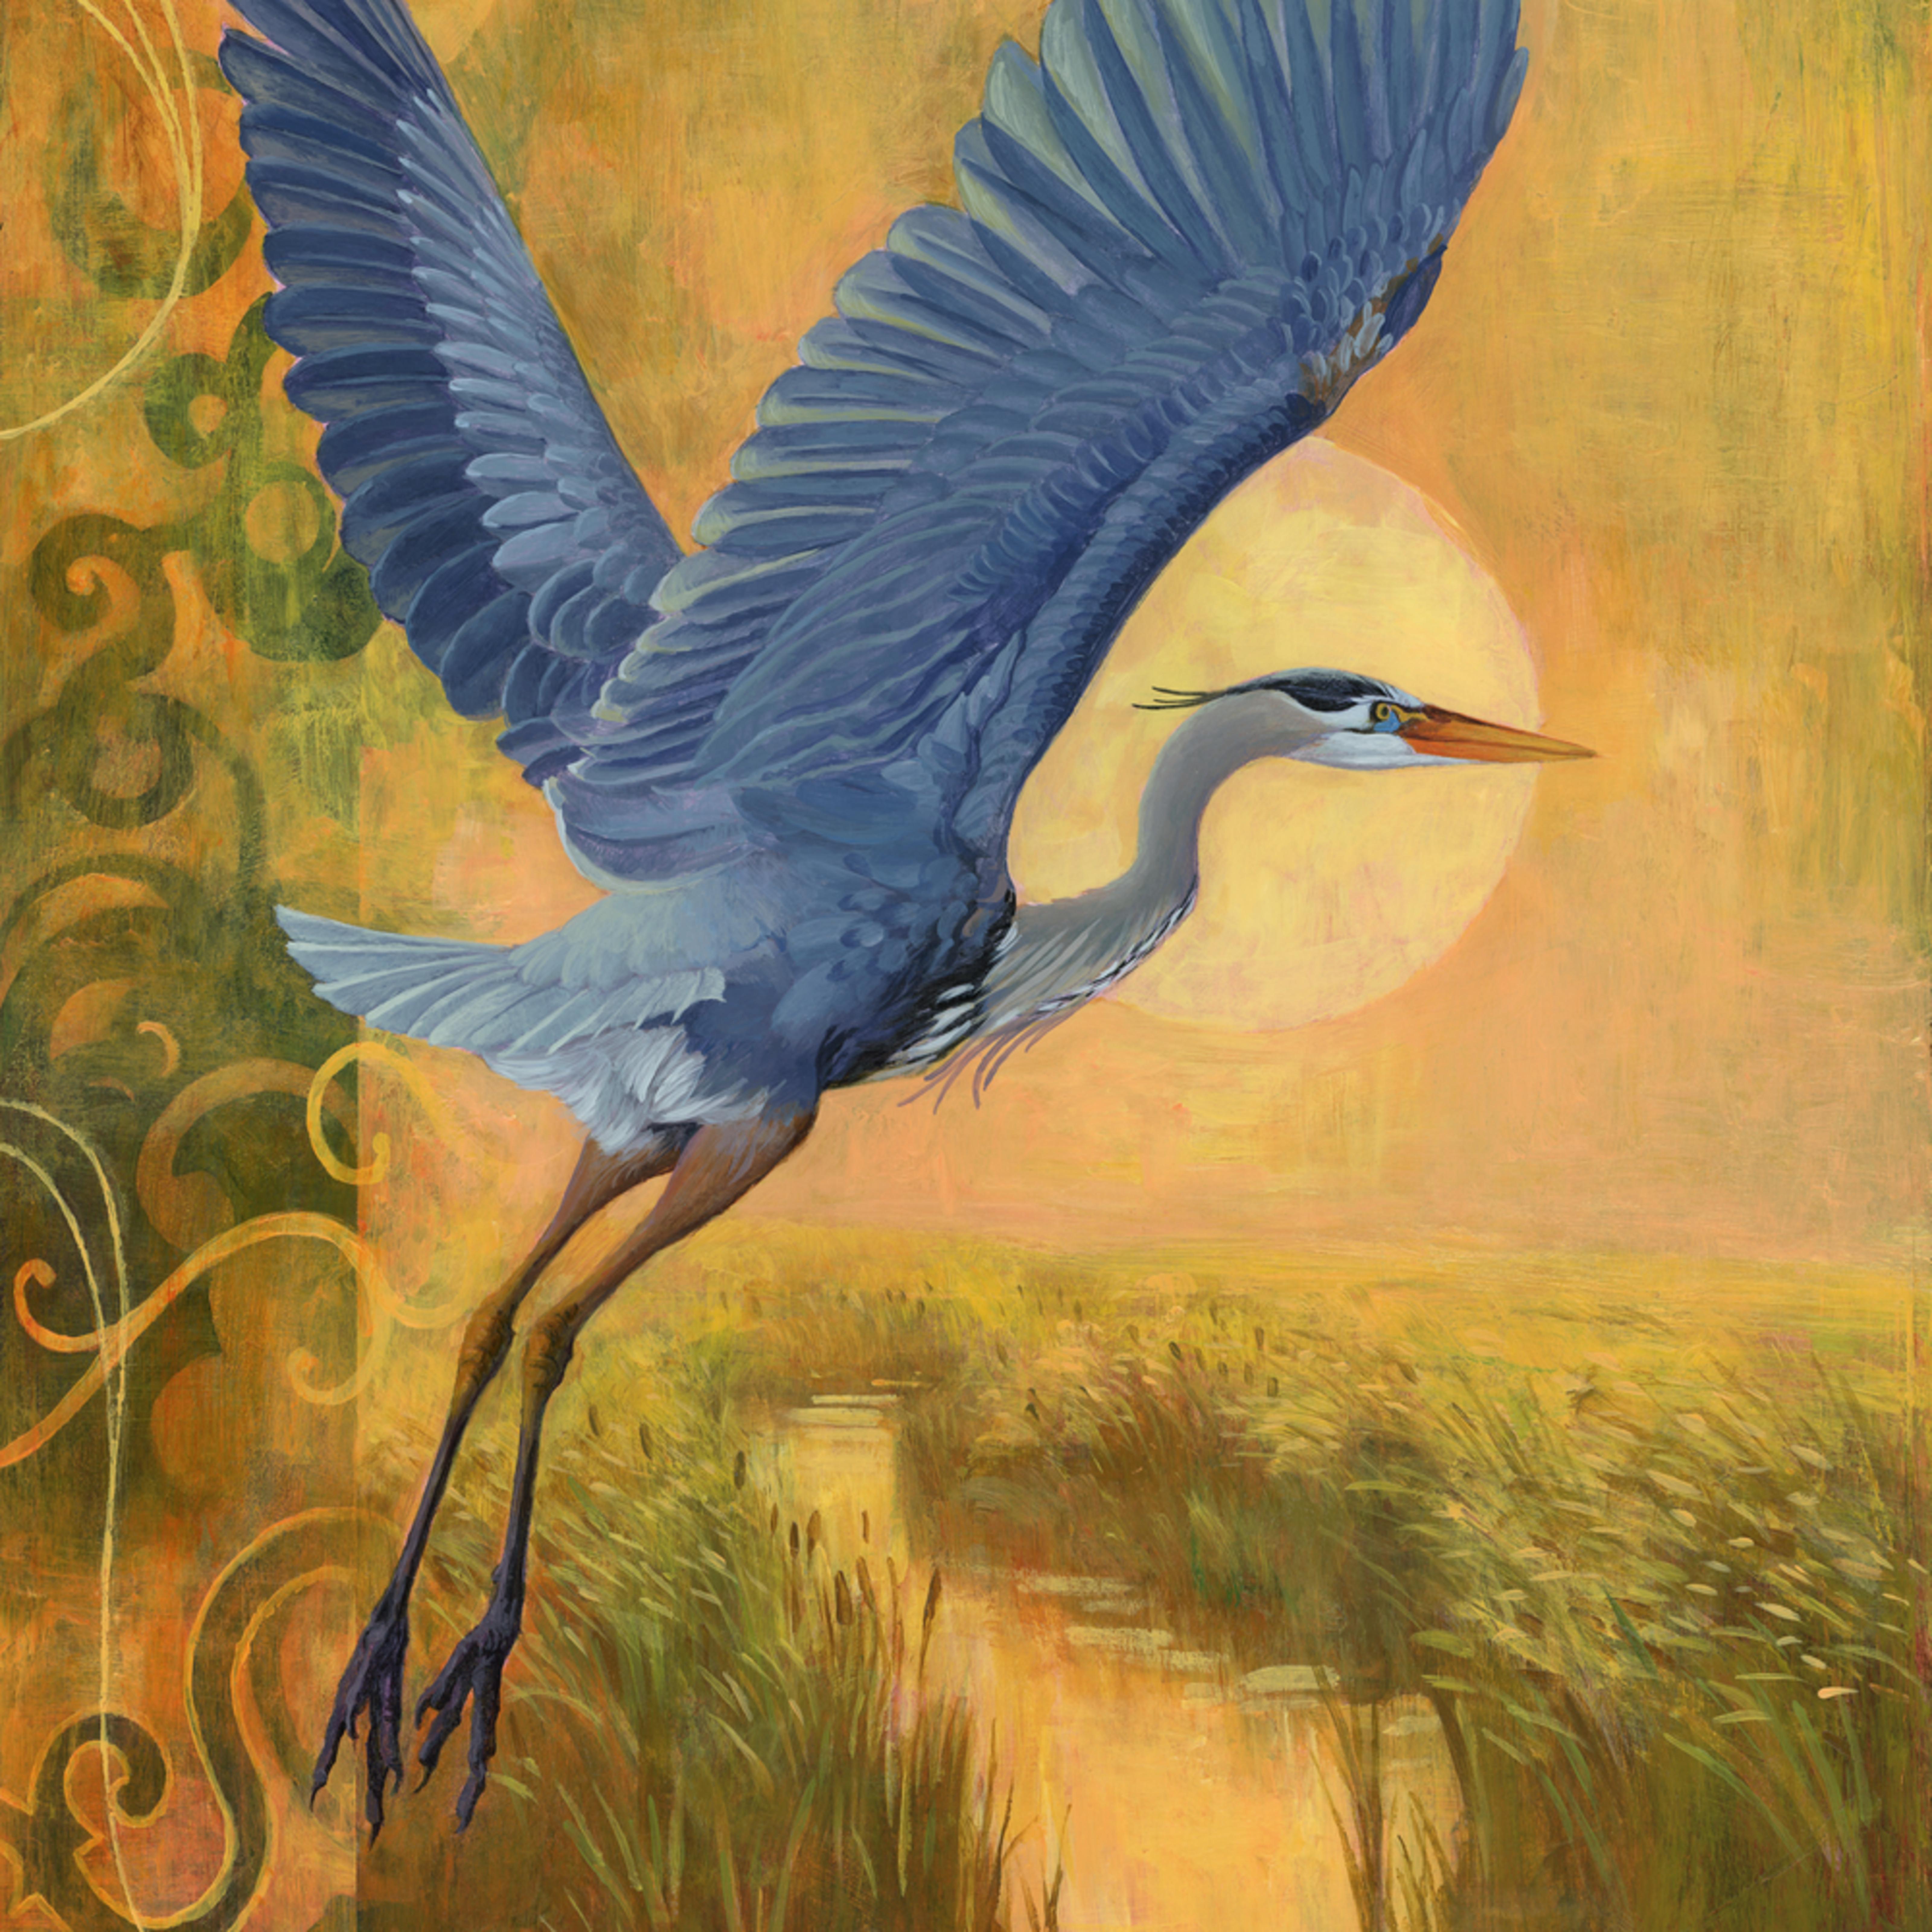 Blue heron painting l83gdx